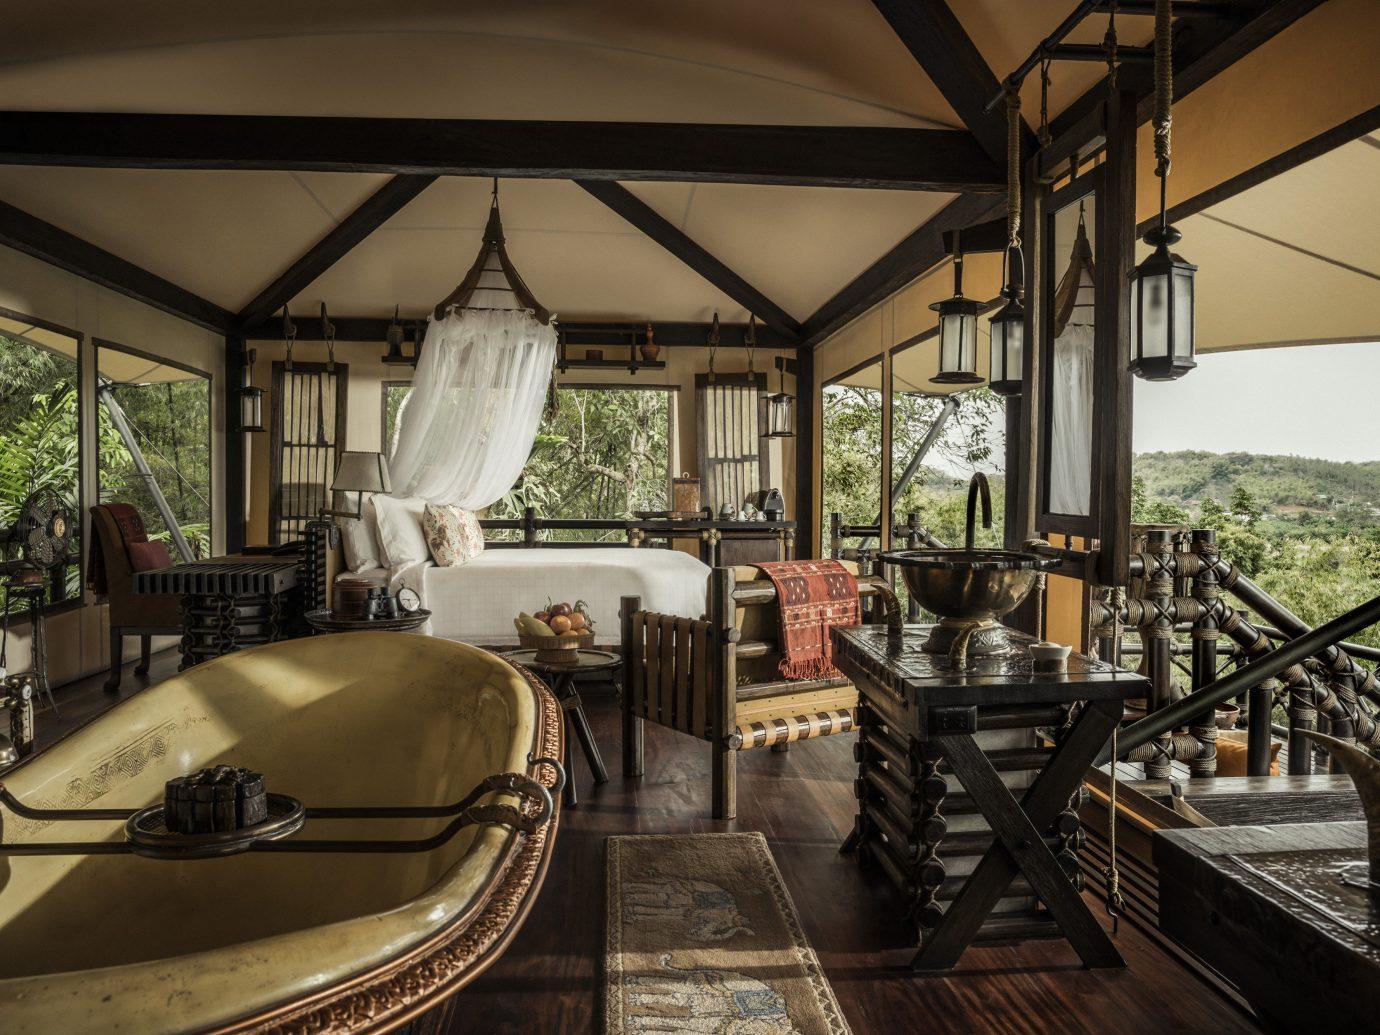 Hotels Luxury Travel Trip Ideas indoor room building estate Resort restaurant home vehicle cottage interior design Villa furniture several